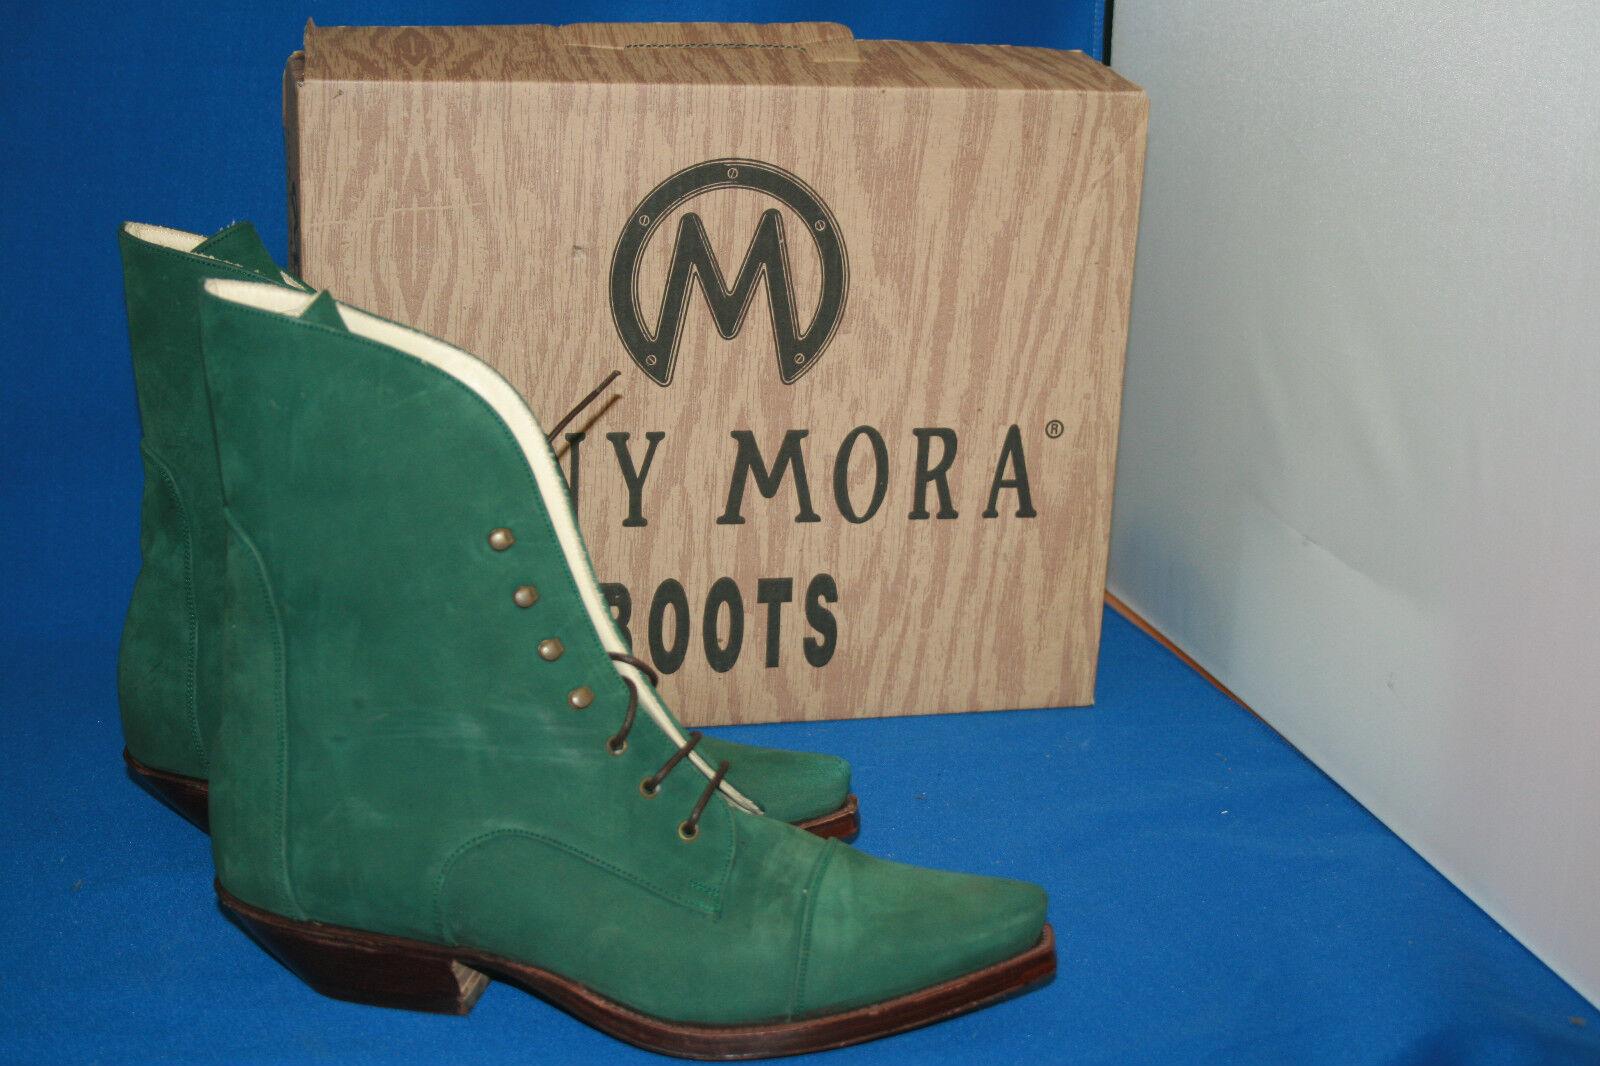 Tony Mora stiefelette grün westernstyle cowboystiefel Stiefel gr. 37 neu  leder